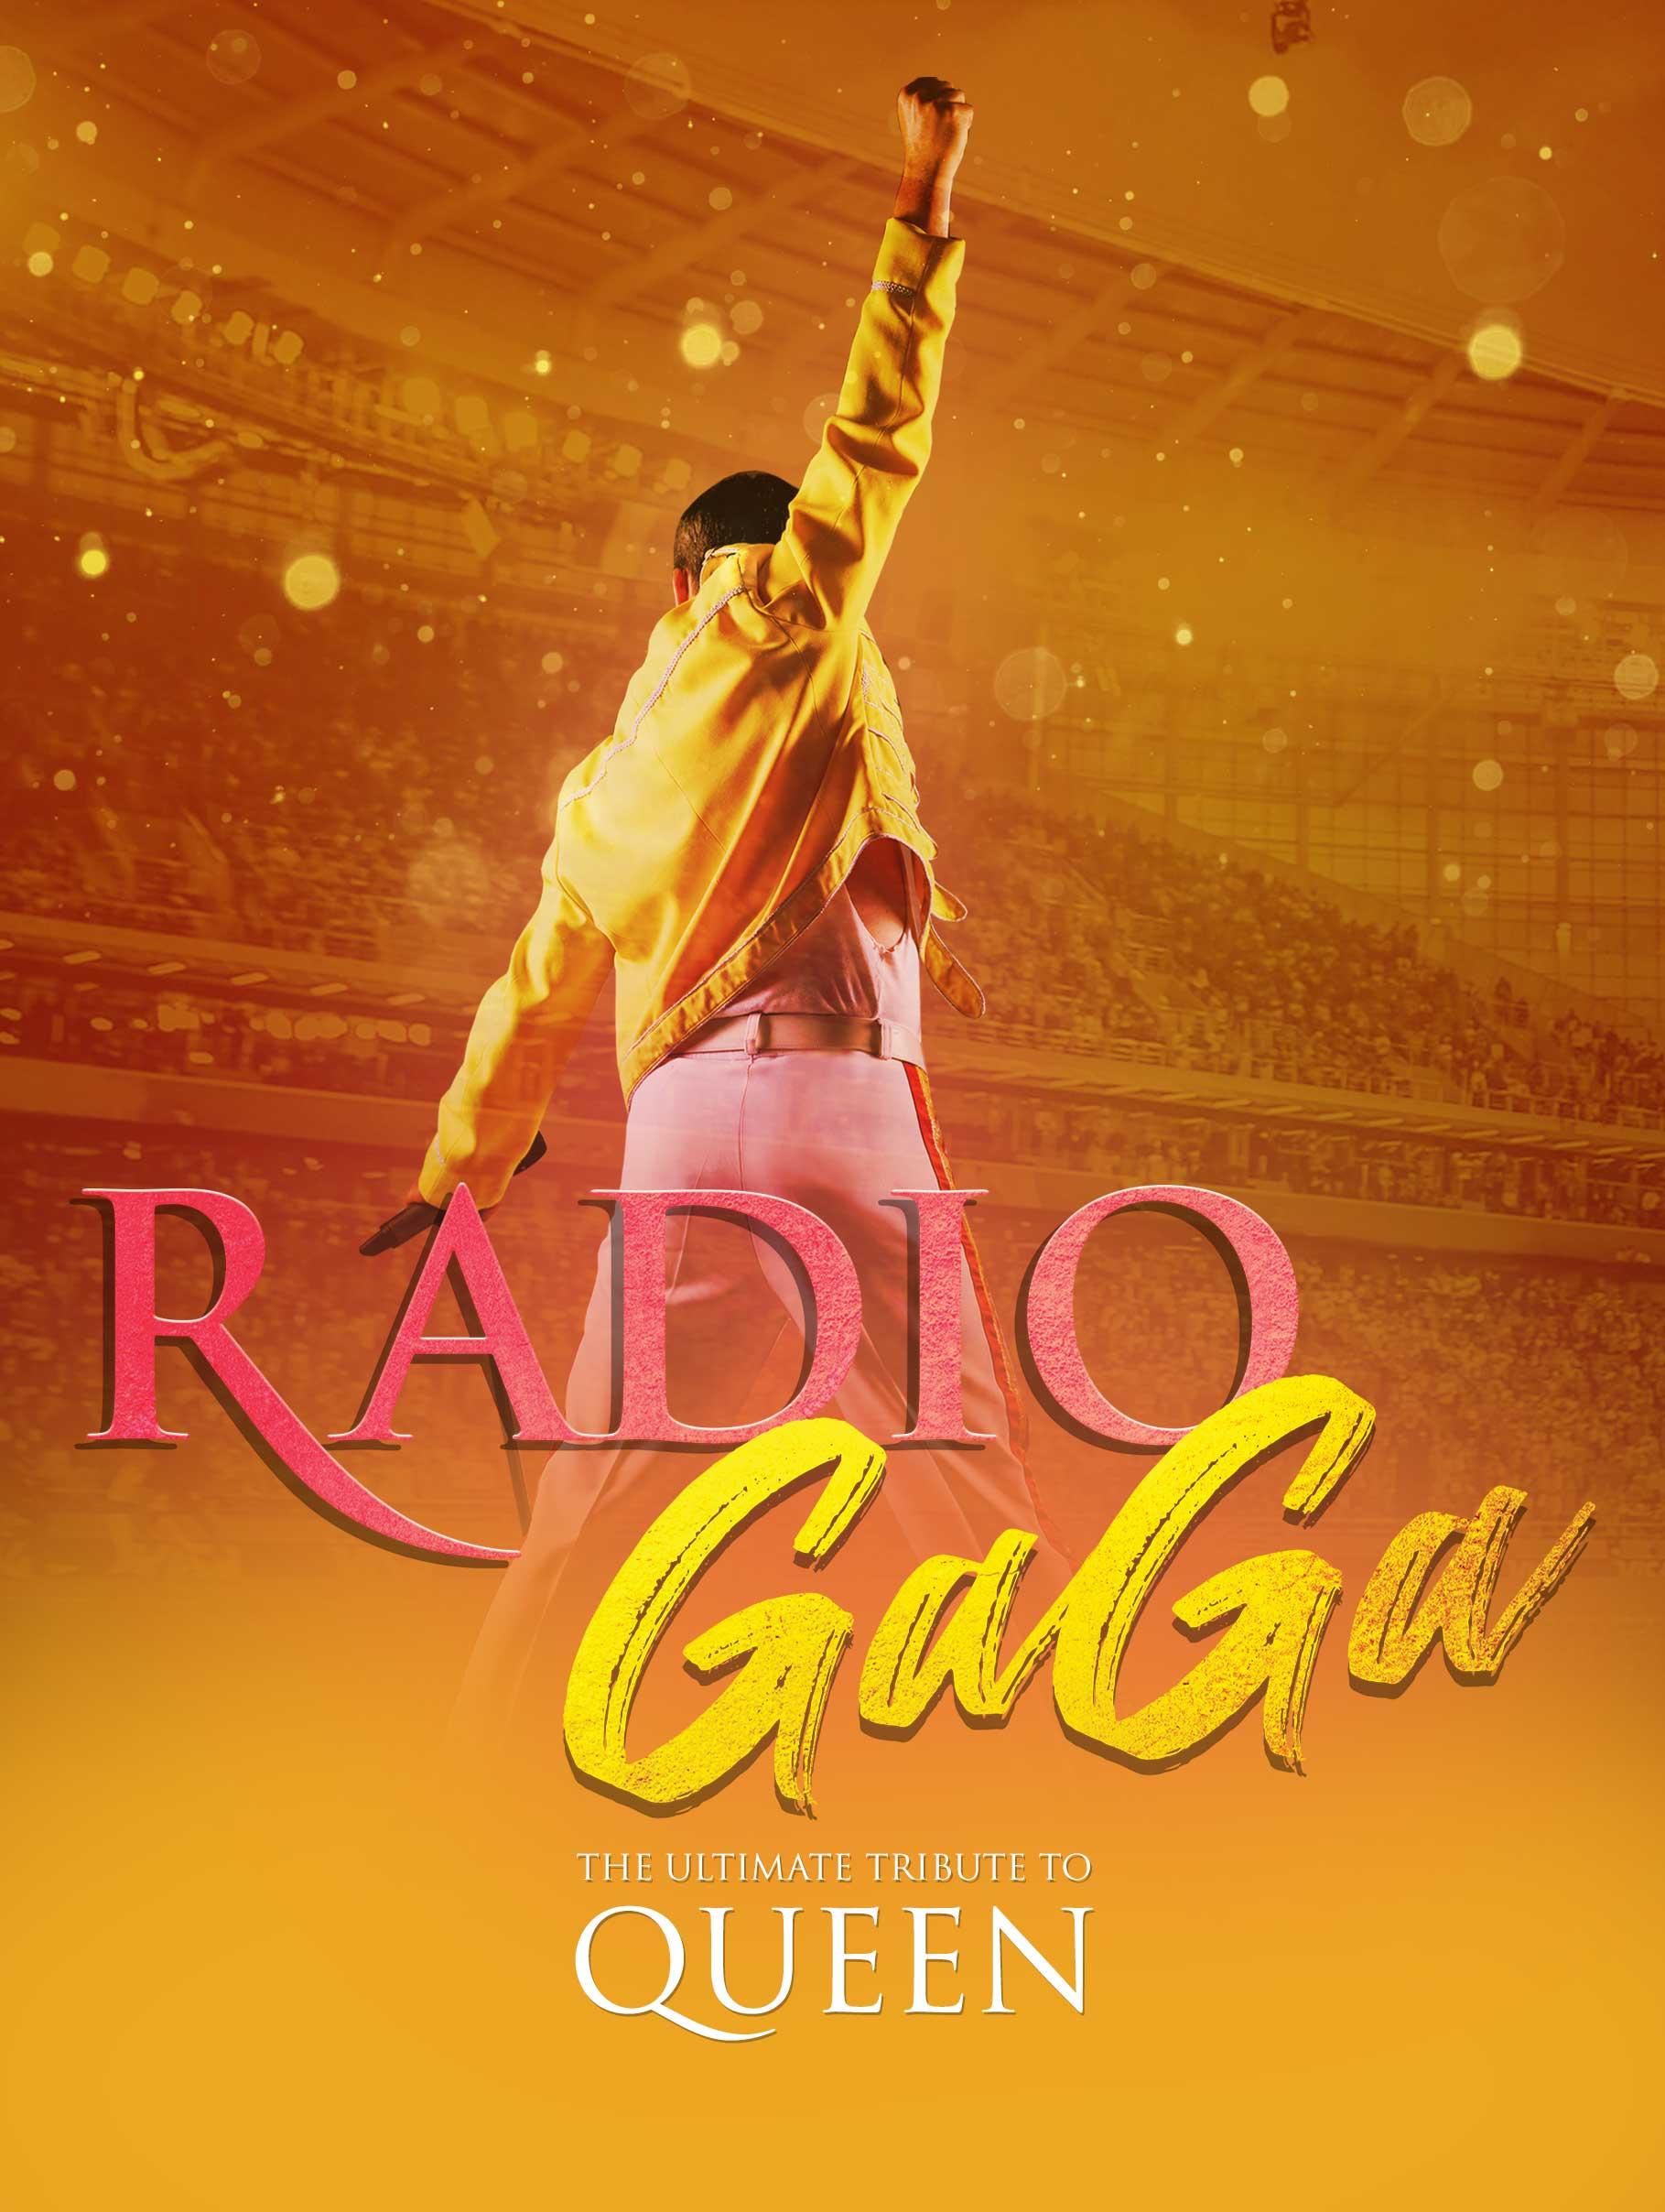 Brentwood Live - Radio Ga Ga banner image